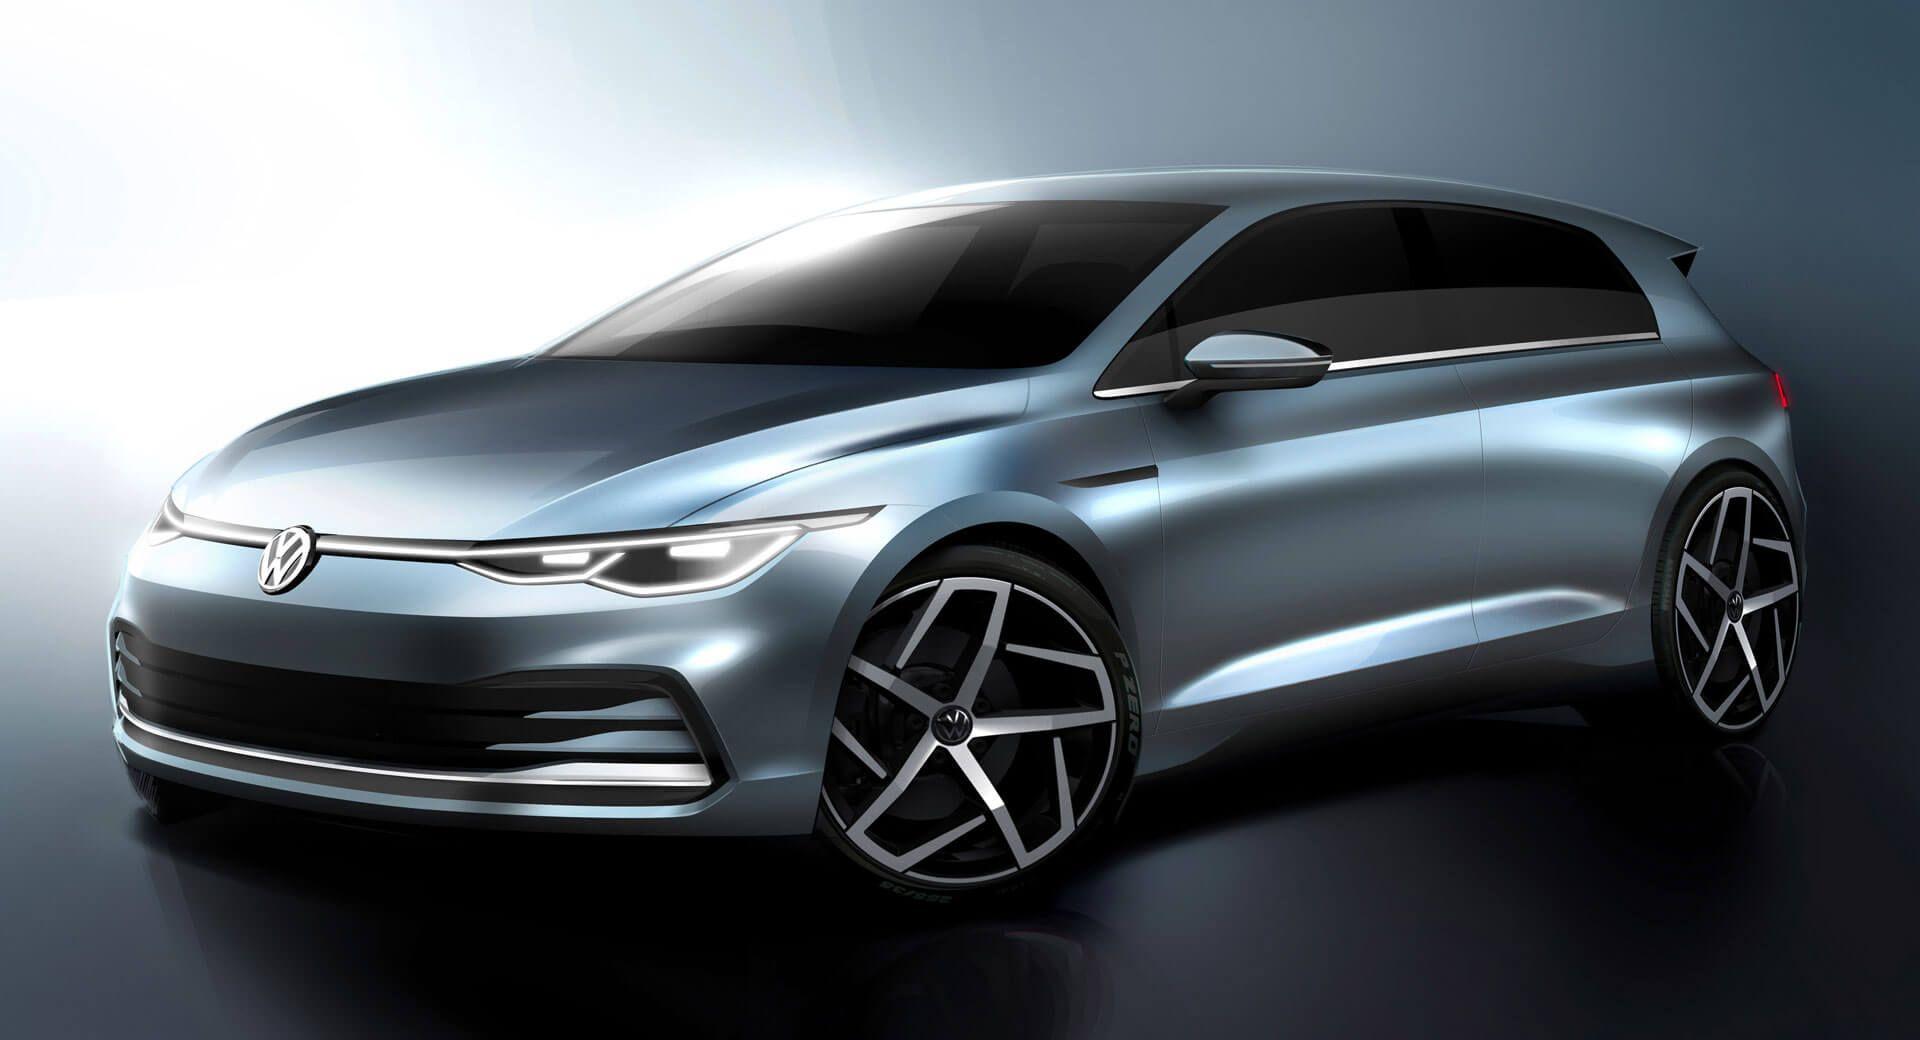 2020 Vw Golf Mk8 Official Sketches Optimistically Tease What We Ve Already Seen Featured Newcars Phev Tech Vw Volkswagen Golf Volkswagen Motor De Partida